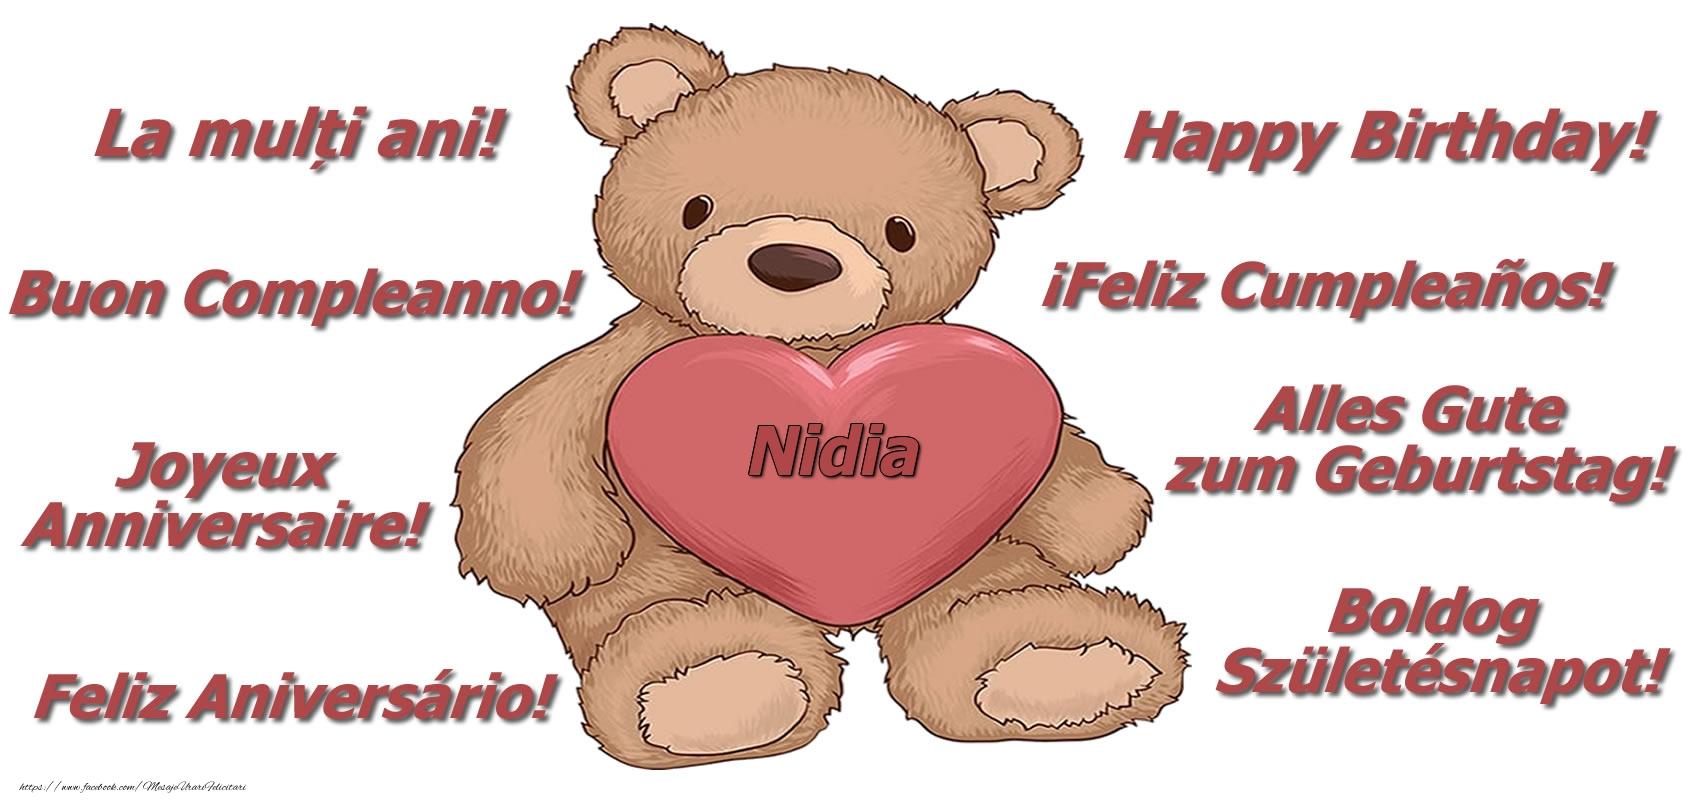 Felicitari de zi de nastere - La multi ani Nidia! - Ursulet